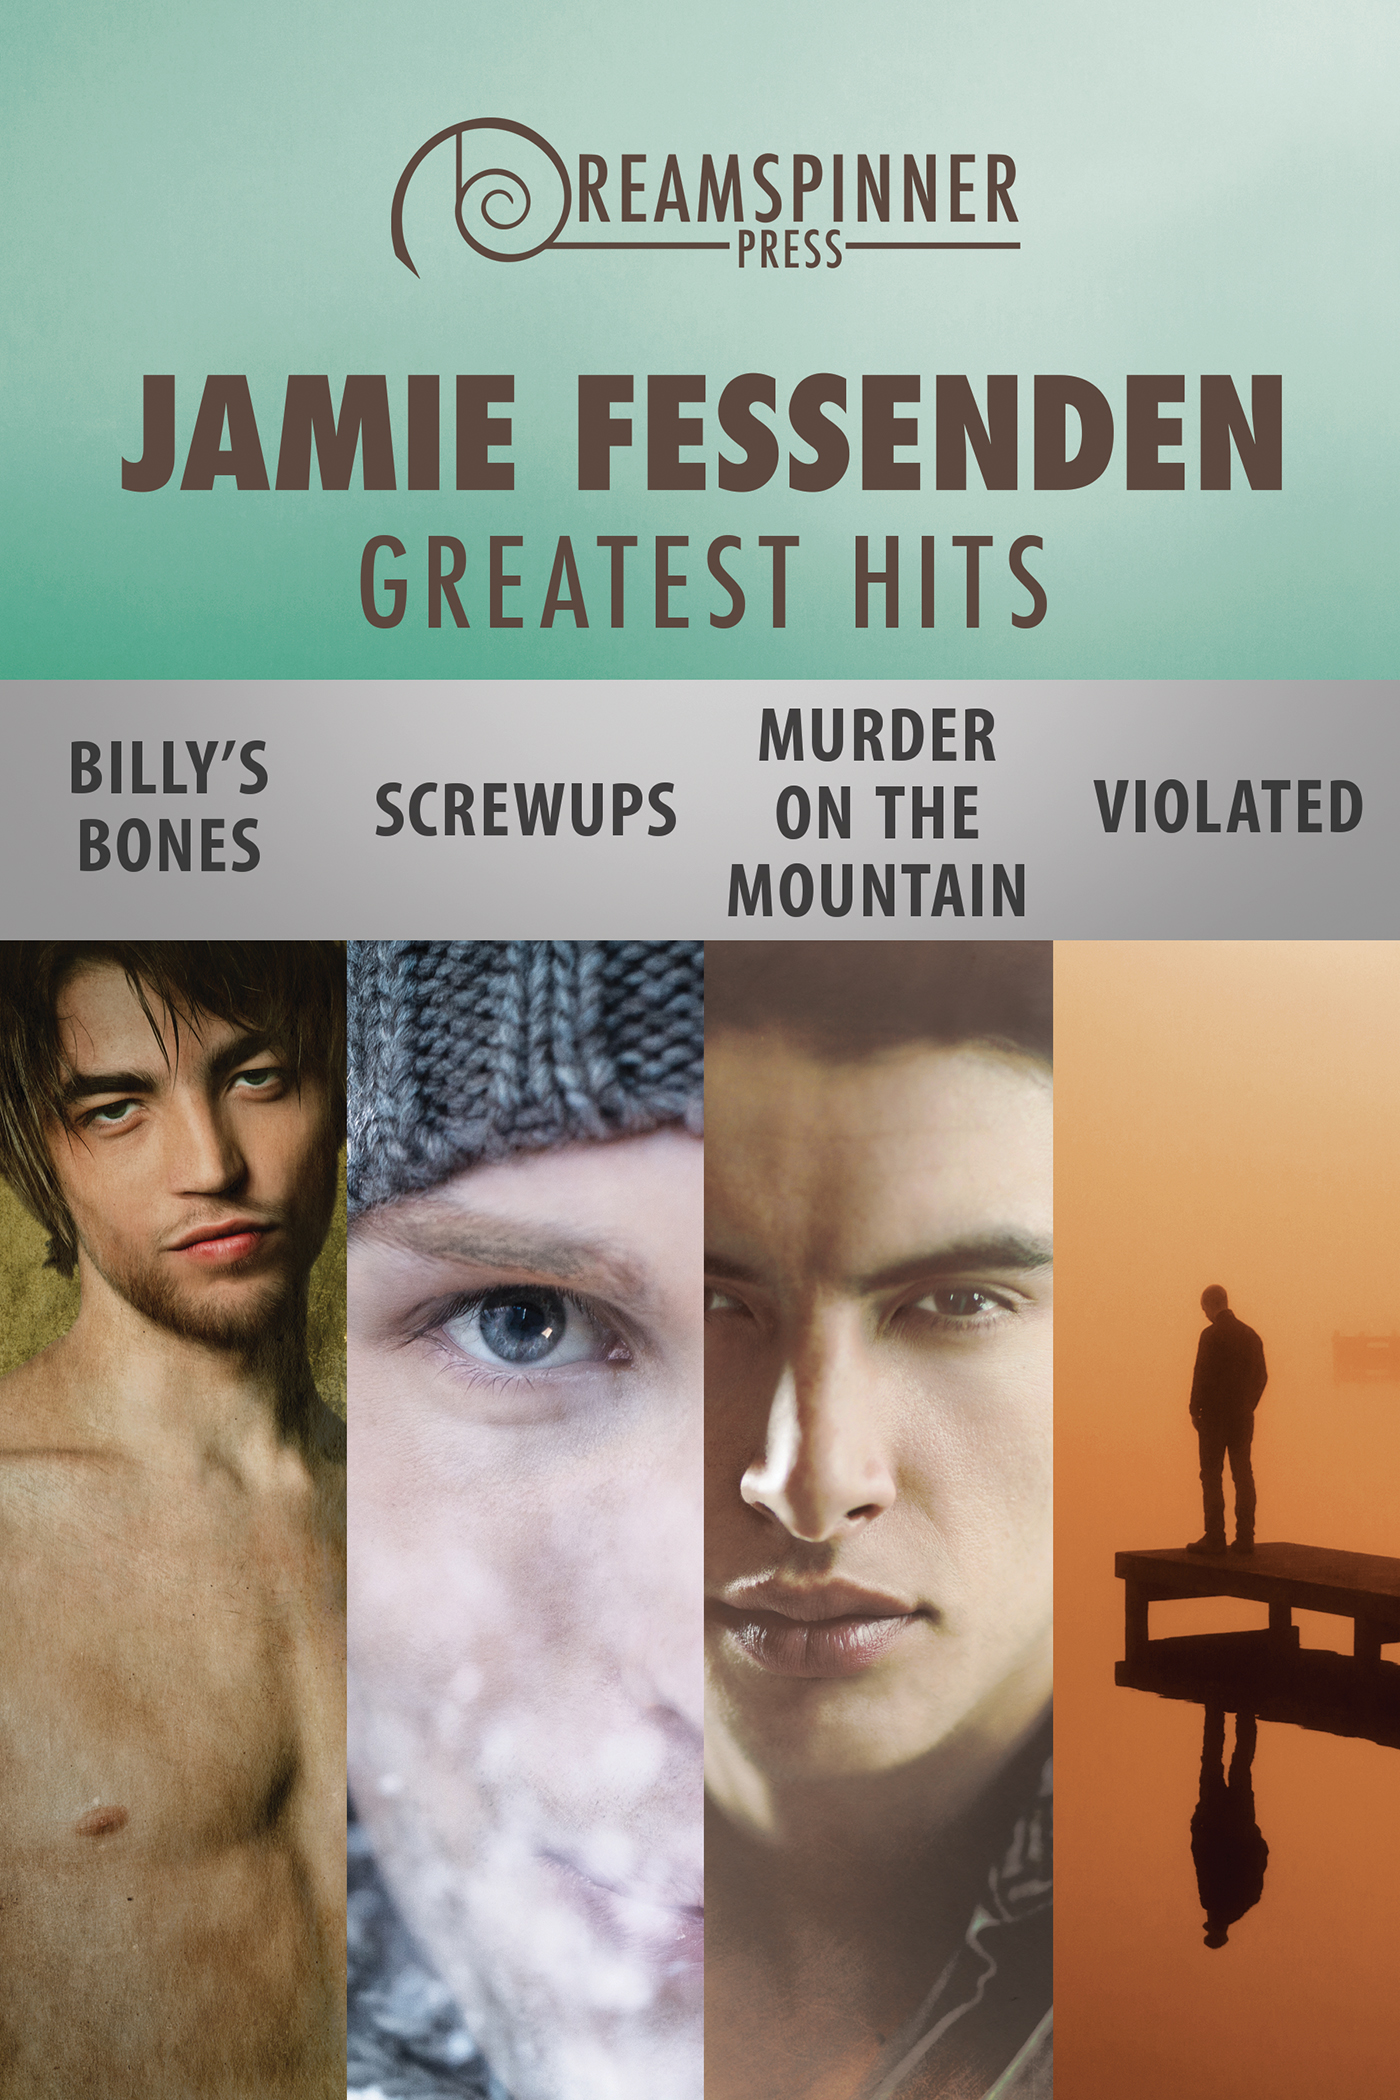 Jamie Fessenden's Greatest Hits